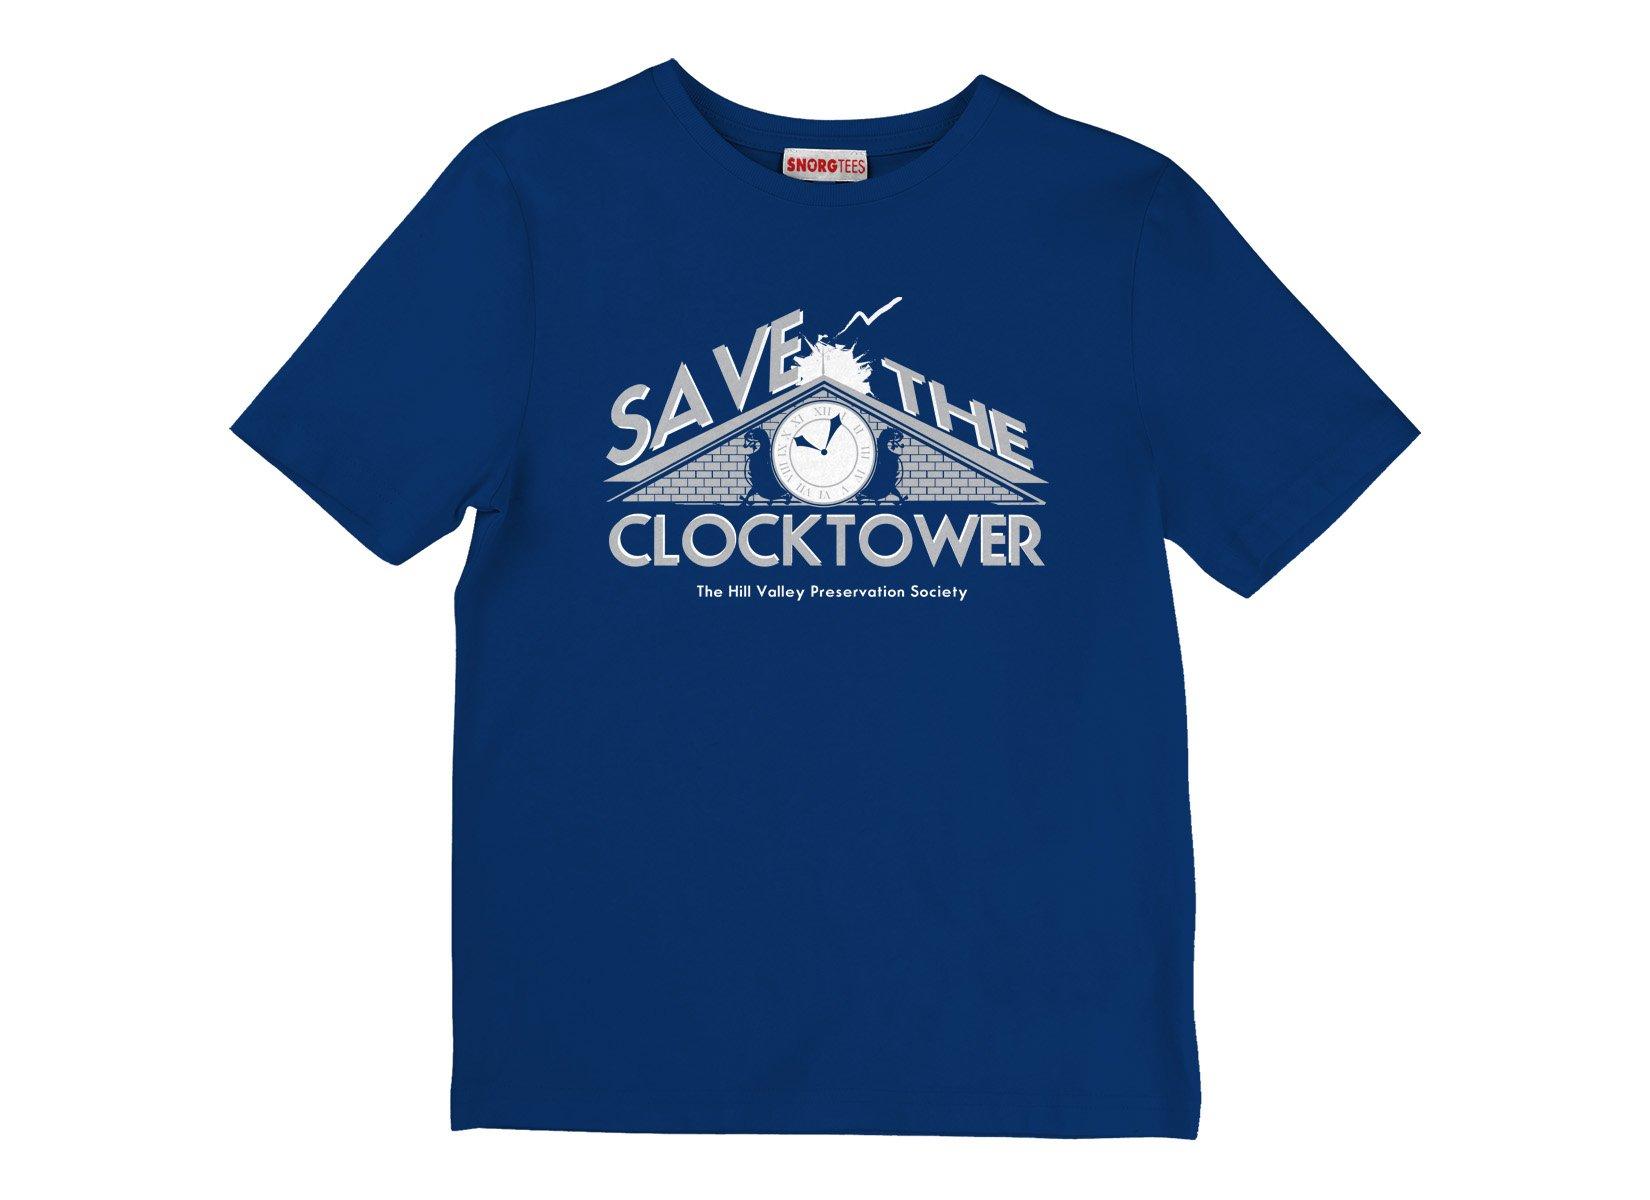 Save The Clocktower on Kids T-Shirt